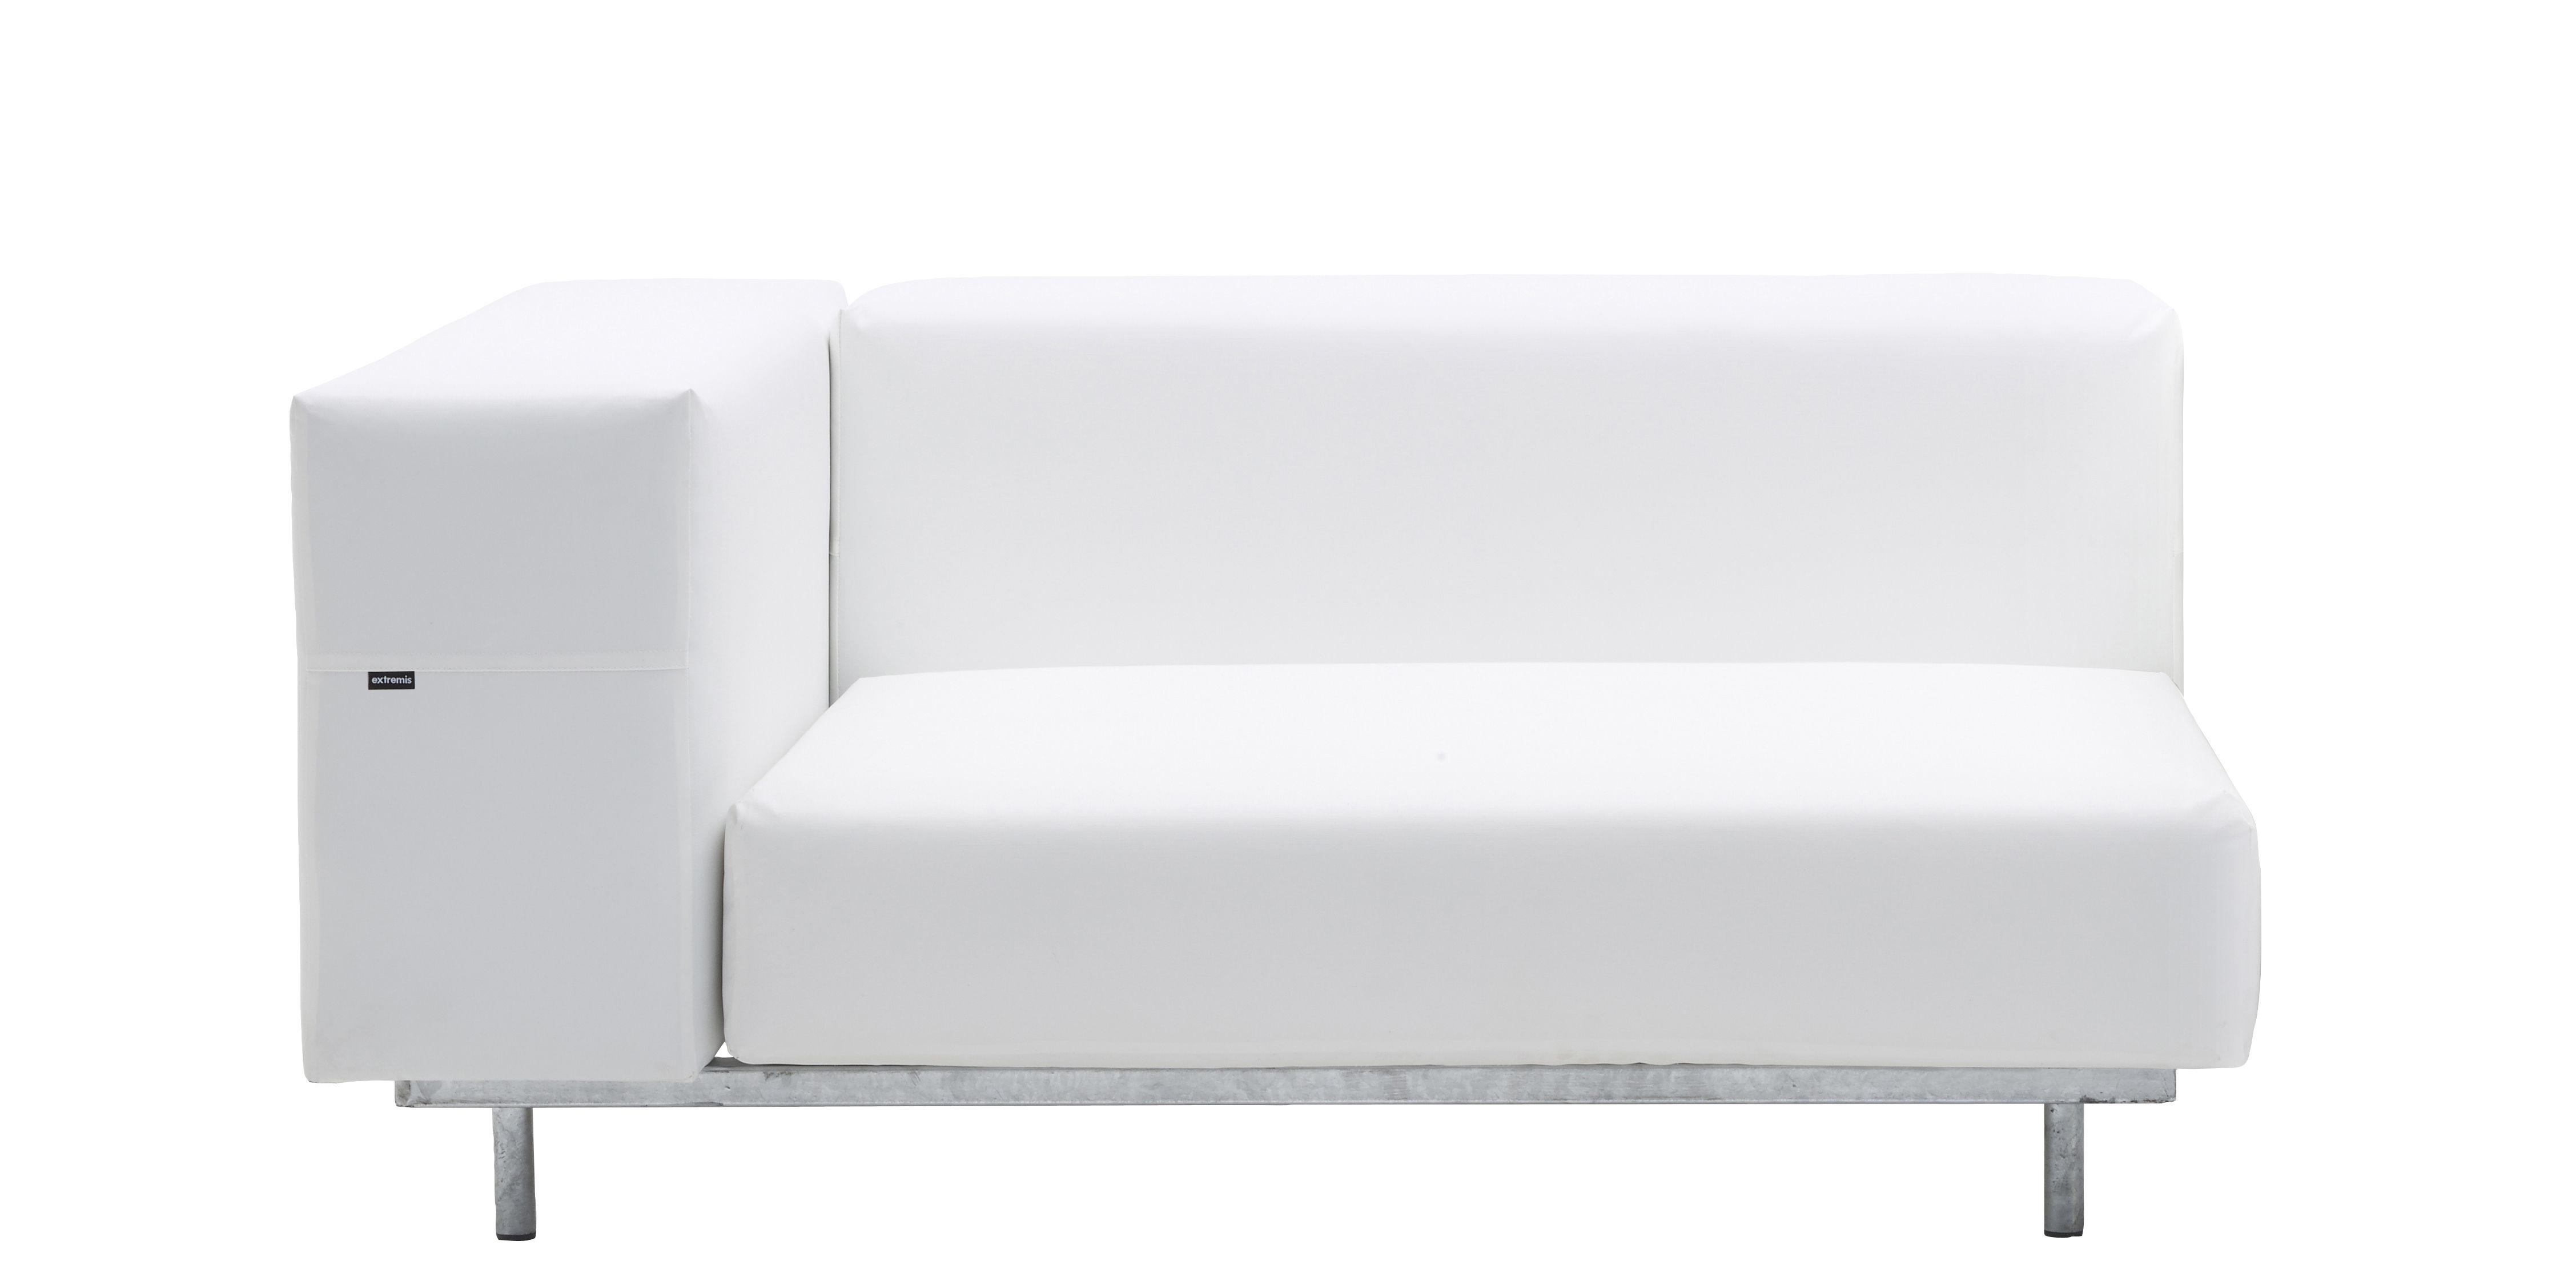 Outdoor - Sofas - Walrus Padded armchair - Corner module by Extremis - Corner module / White - Galvanized steel, Polyurethane foam, Tarpaulin canvas